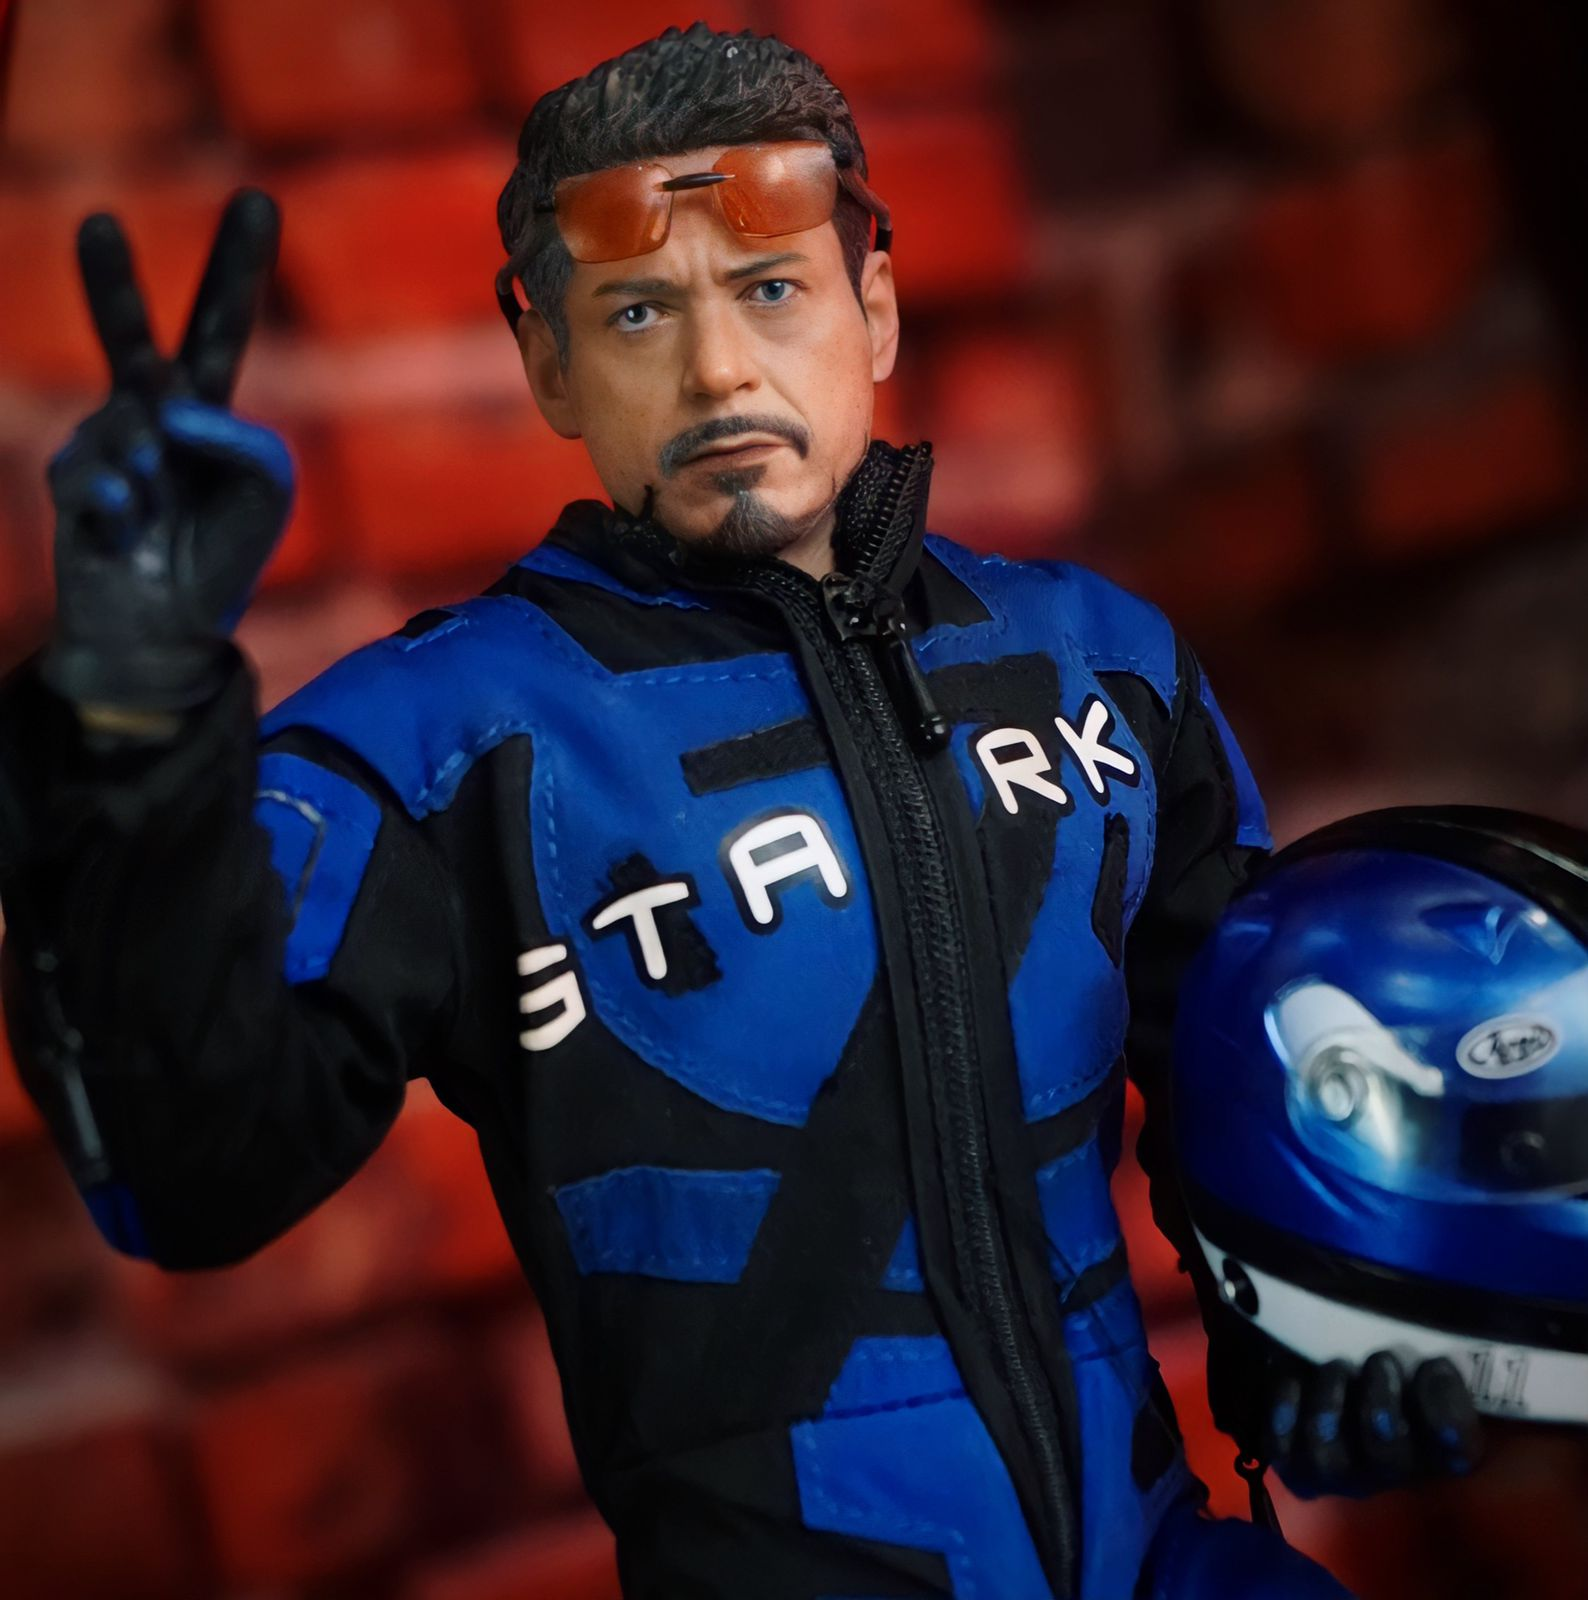 Action Figure Tony Stark Racing Car: Homem de Ferro 2 - Legend Creation